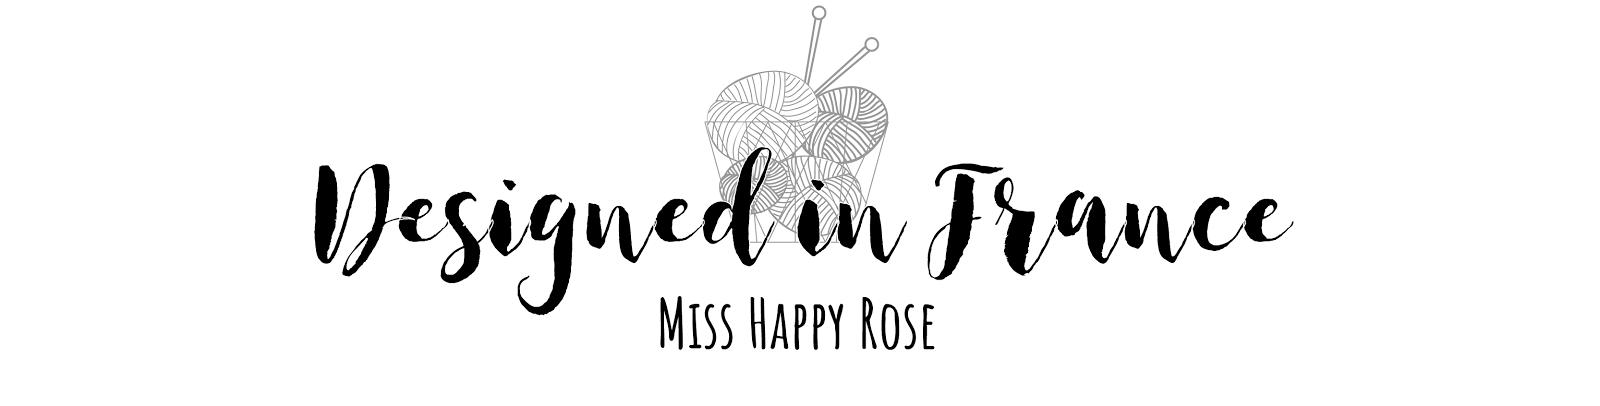 MissHappyRose.com